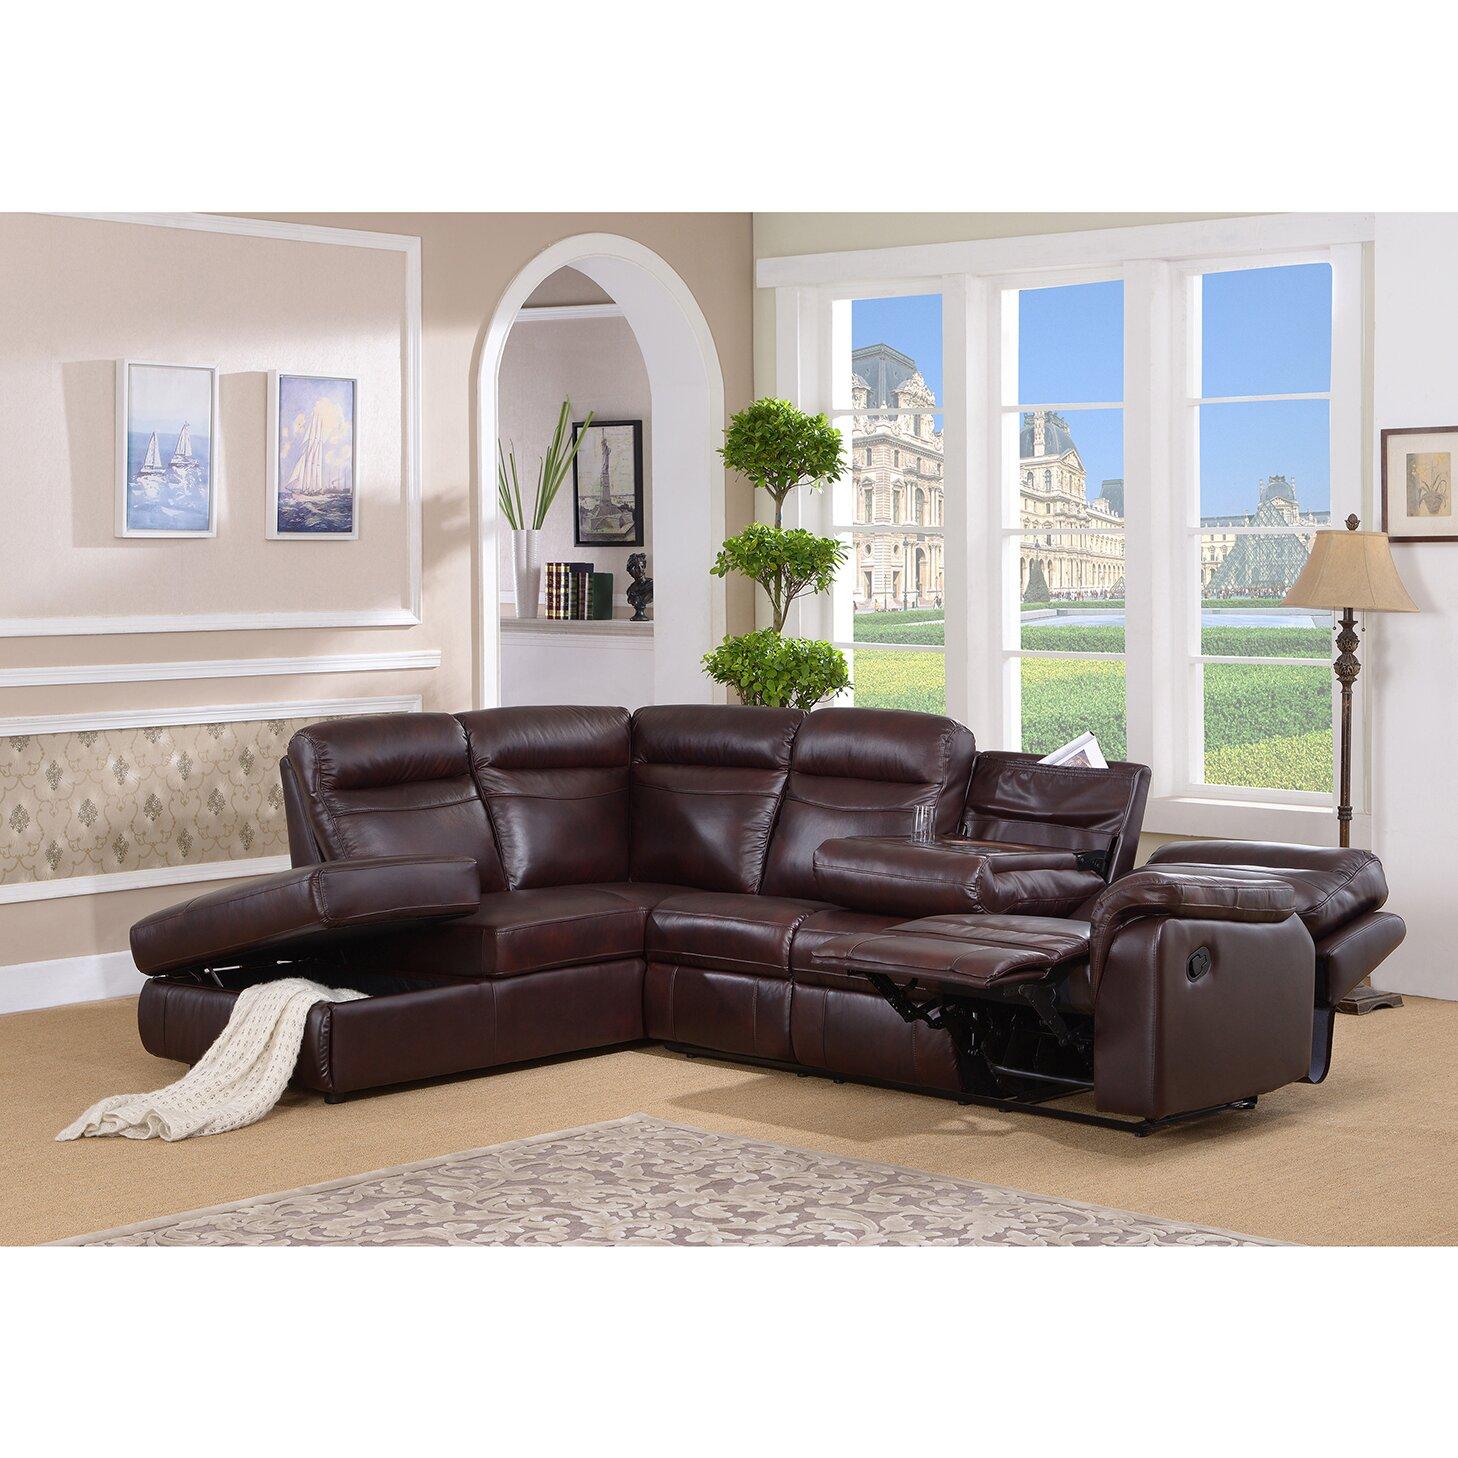 Amax portland sectional reviews wayfair for Sectional sofa portland oregon